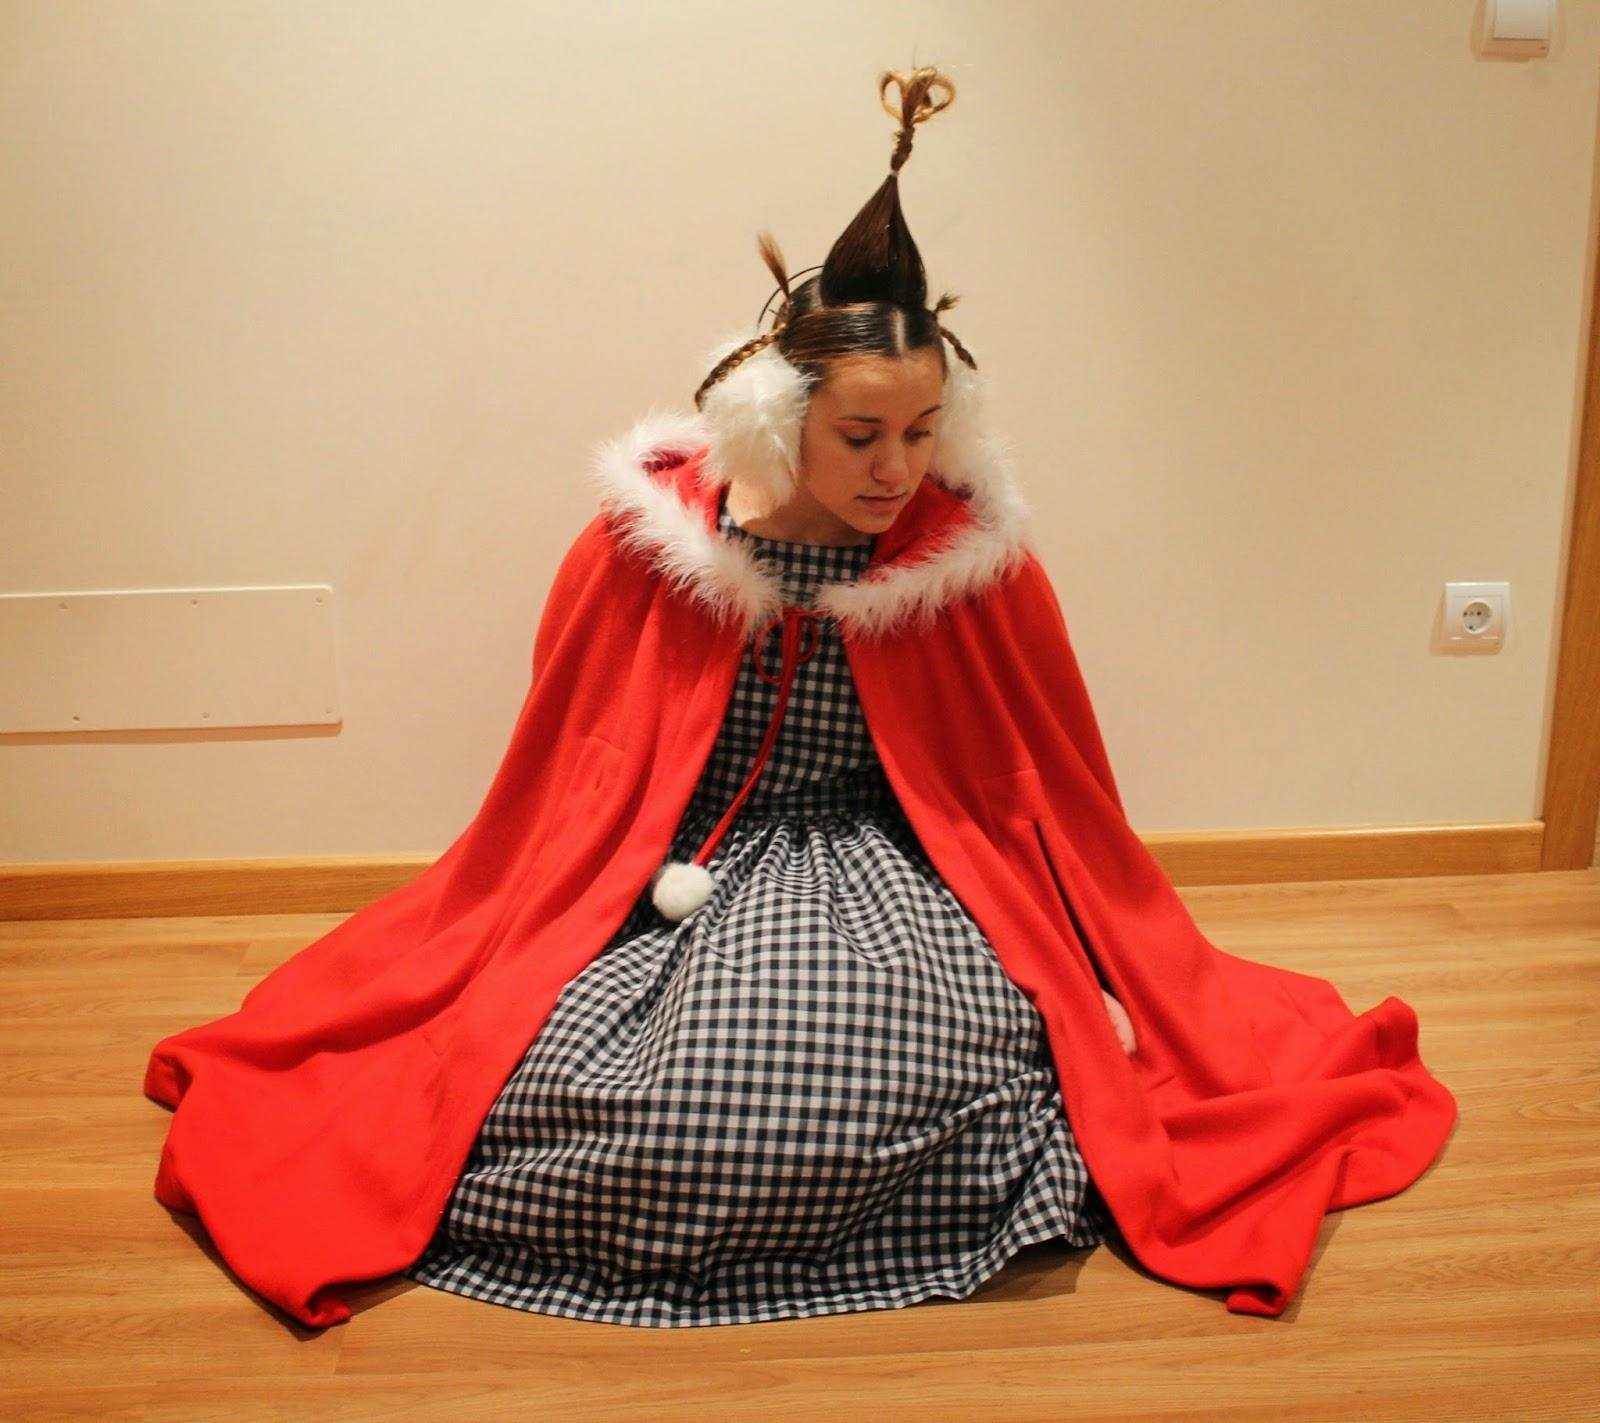 O obradoiro de Klor: Disfraz de Cindy Lou Who, la niña del Grinch